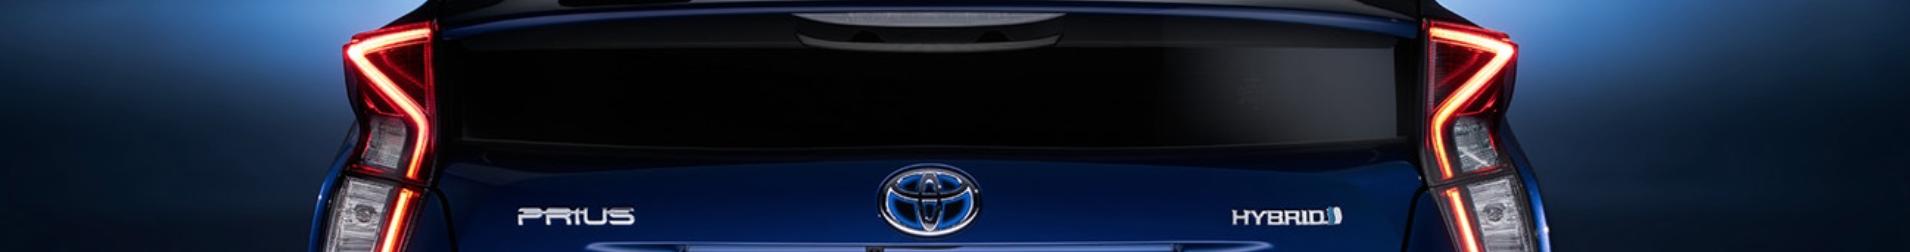 2018 Toyota Prius New York